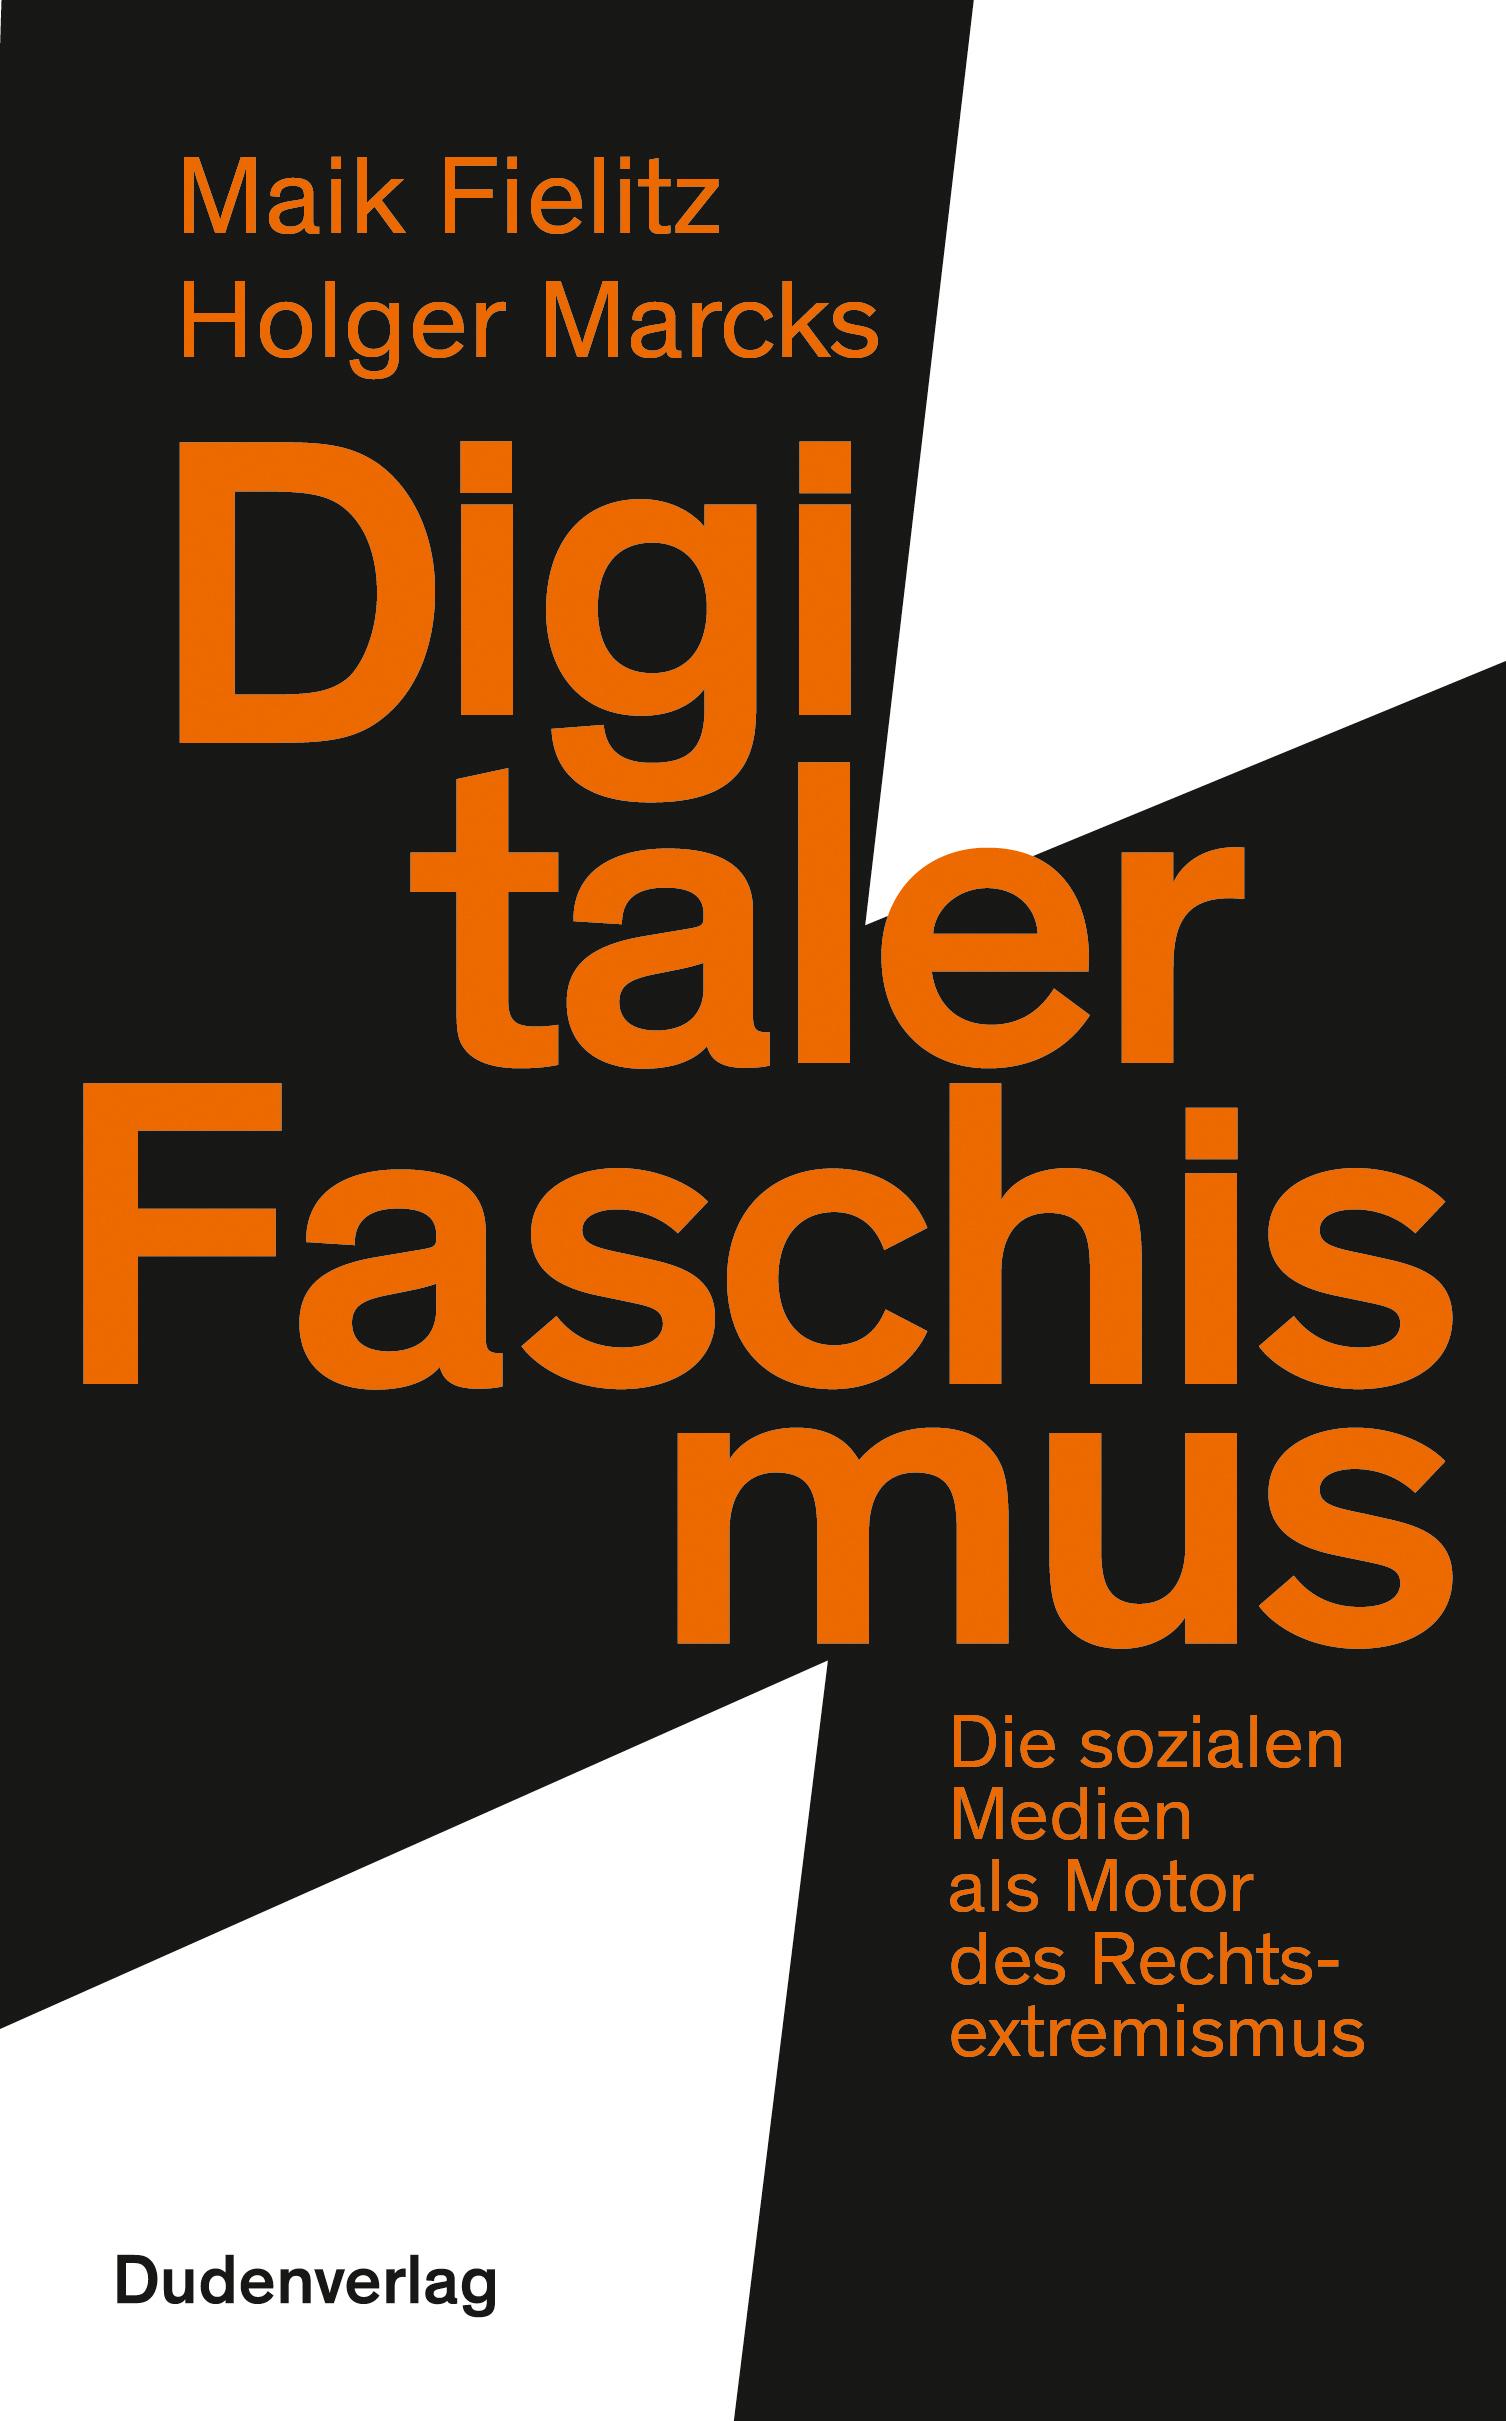 PM2209_Digitaler Faschismus